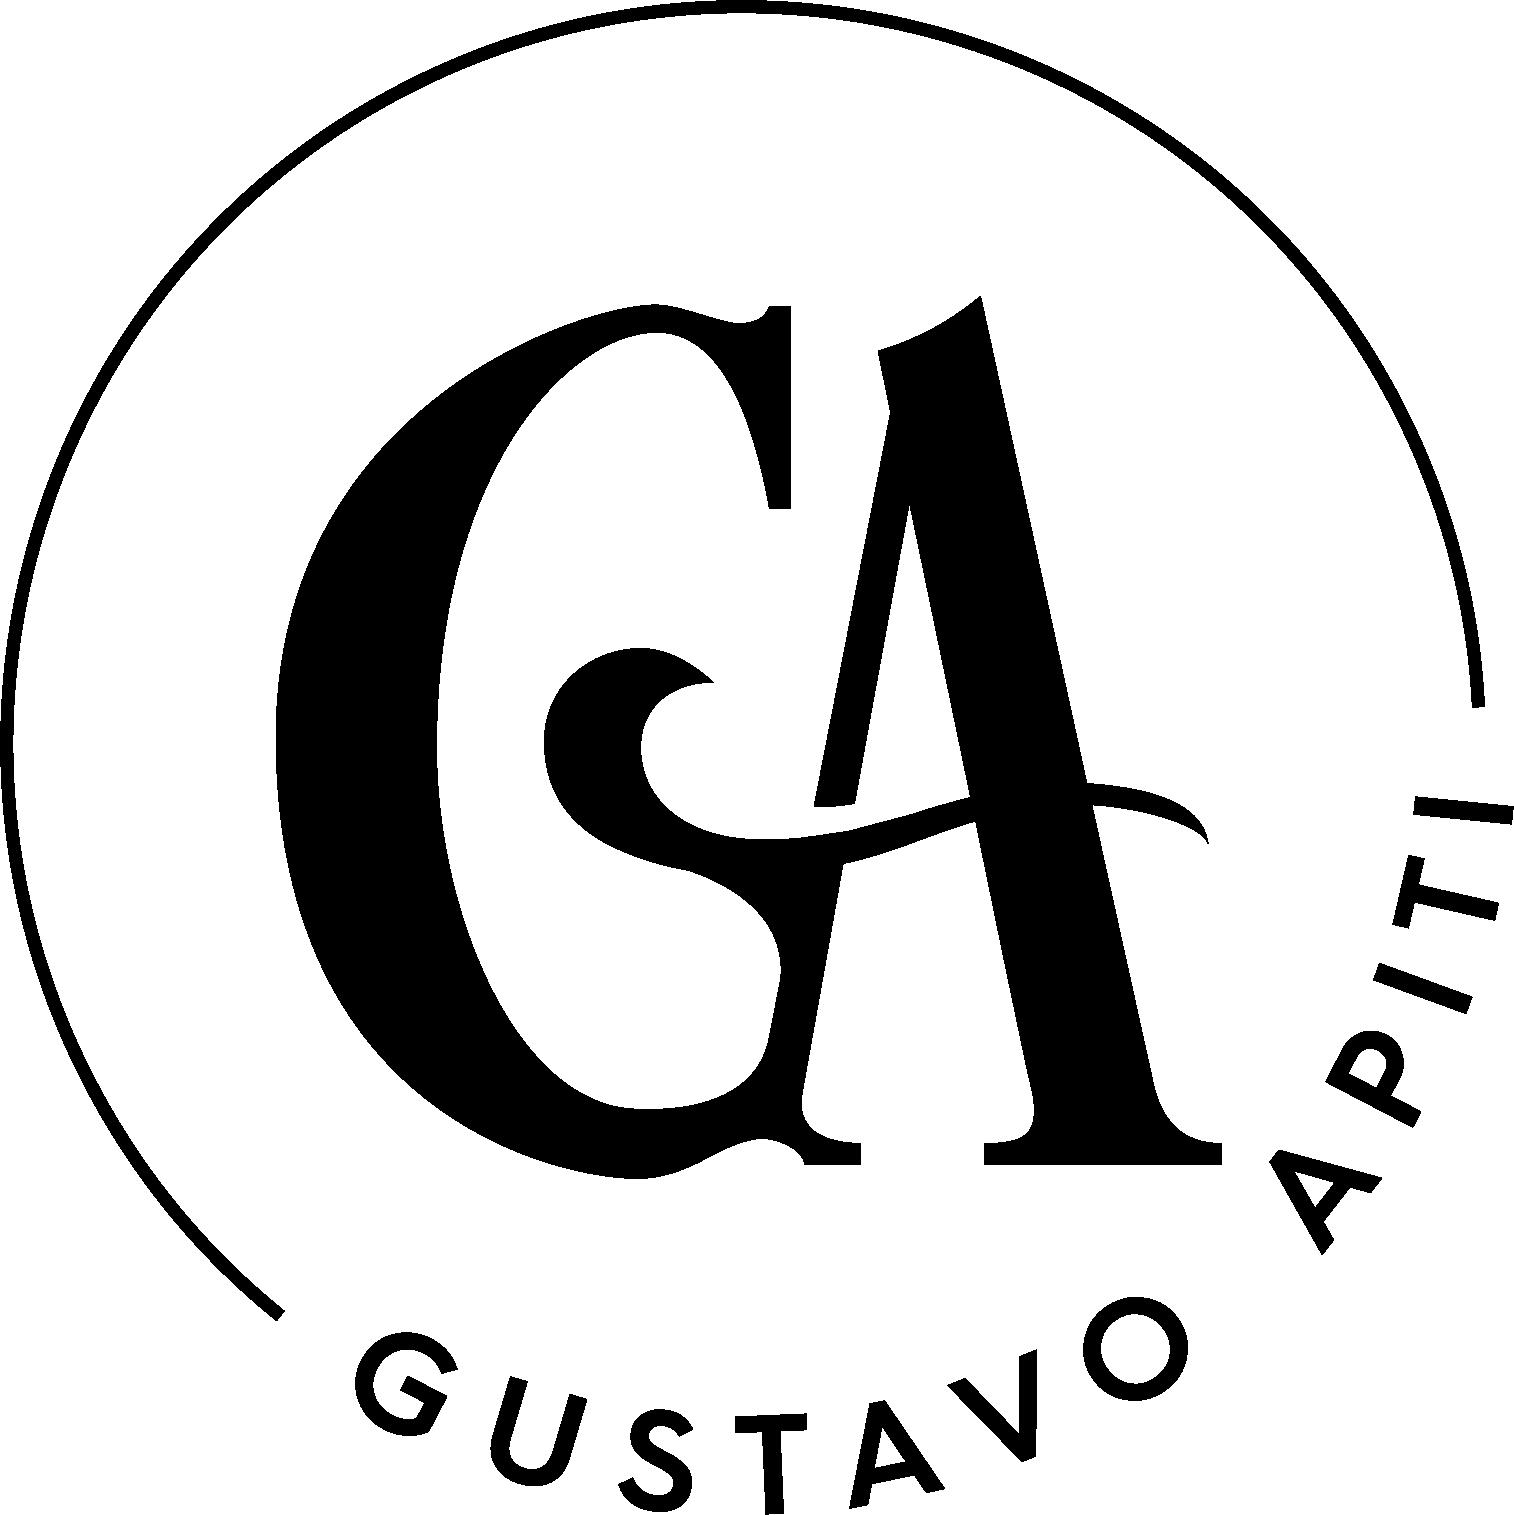 Gustavo Apiti